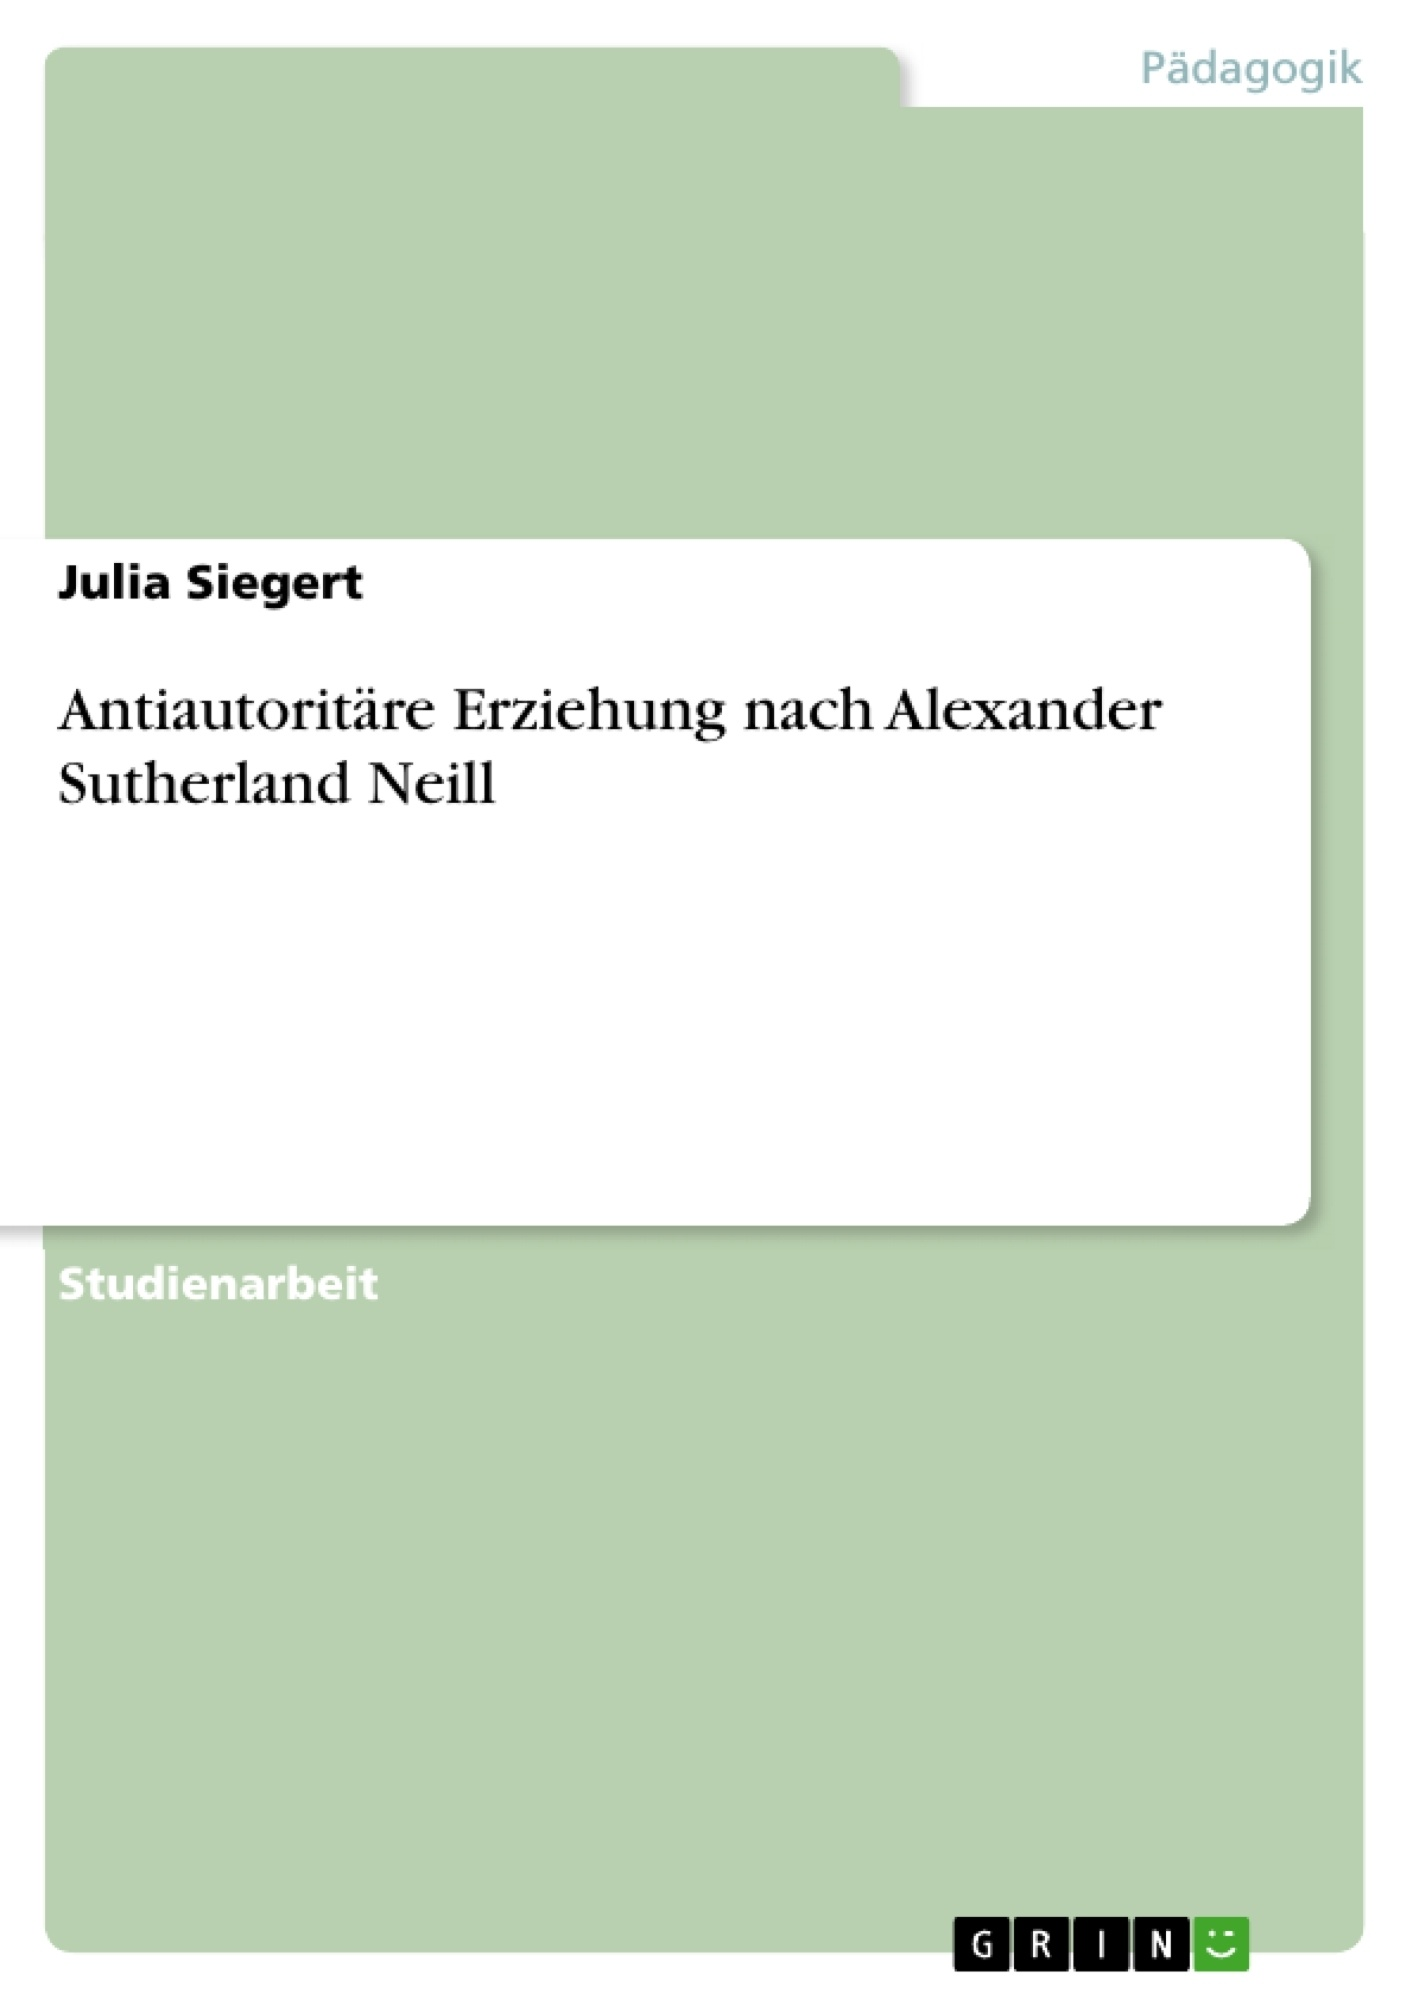 Titel: Antiautoritäre Erziehung nach Alexander Sutherland Neill